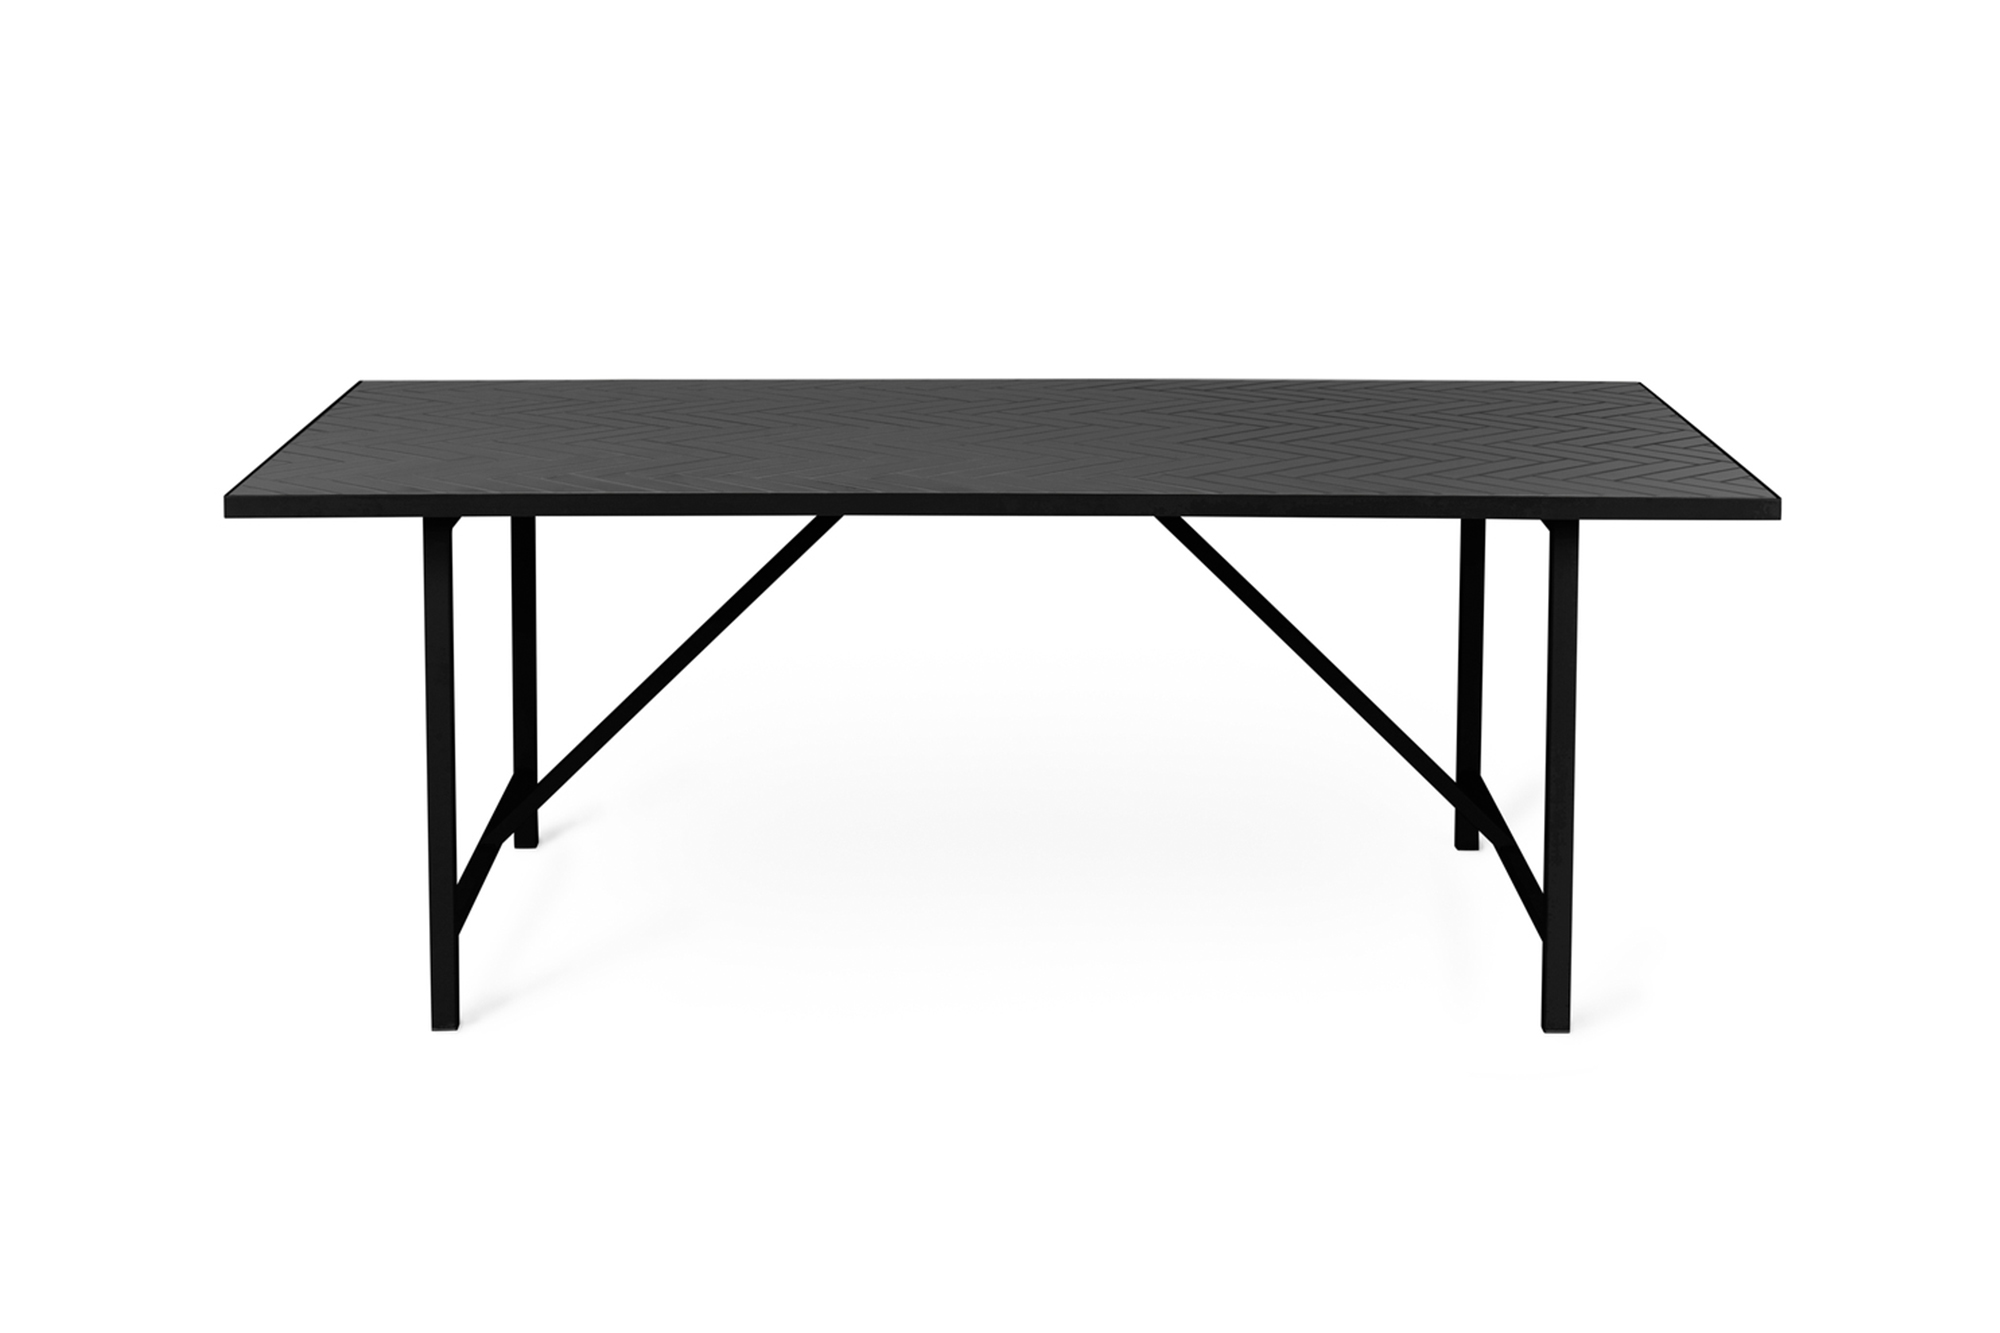 Herringbone Tile Dining Table